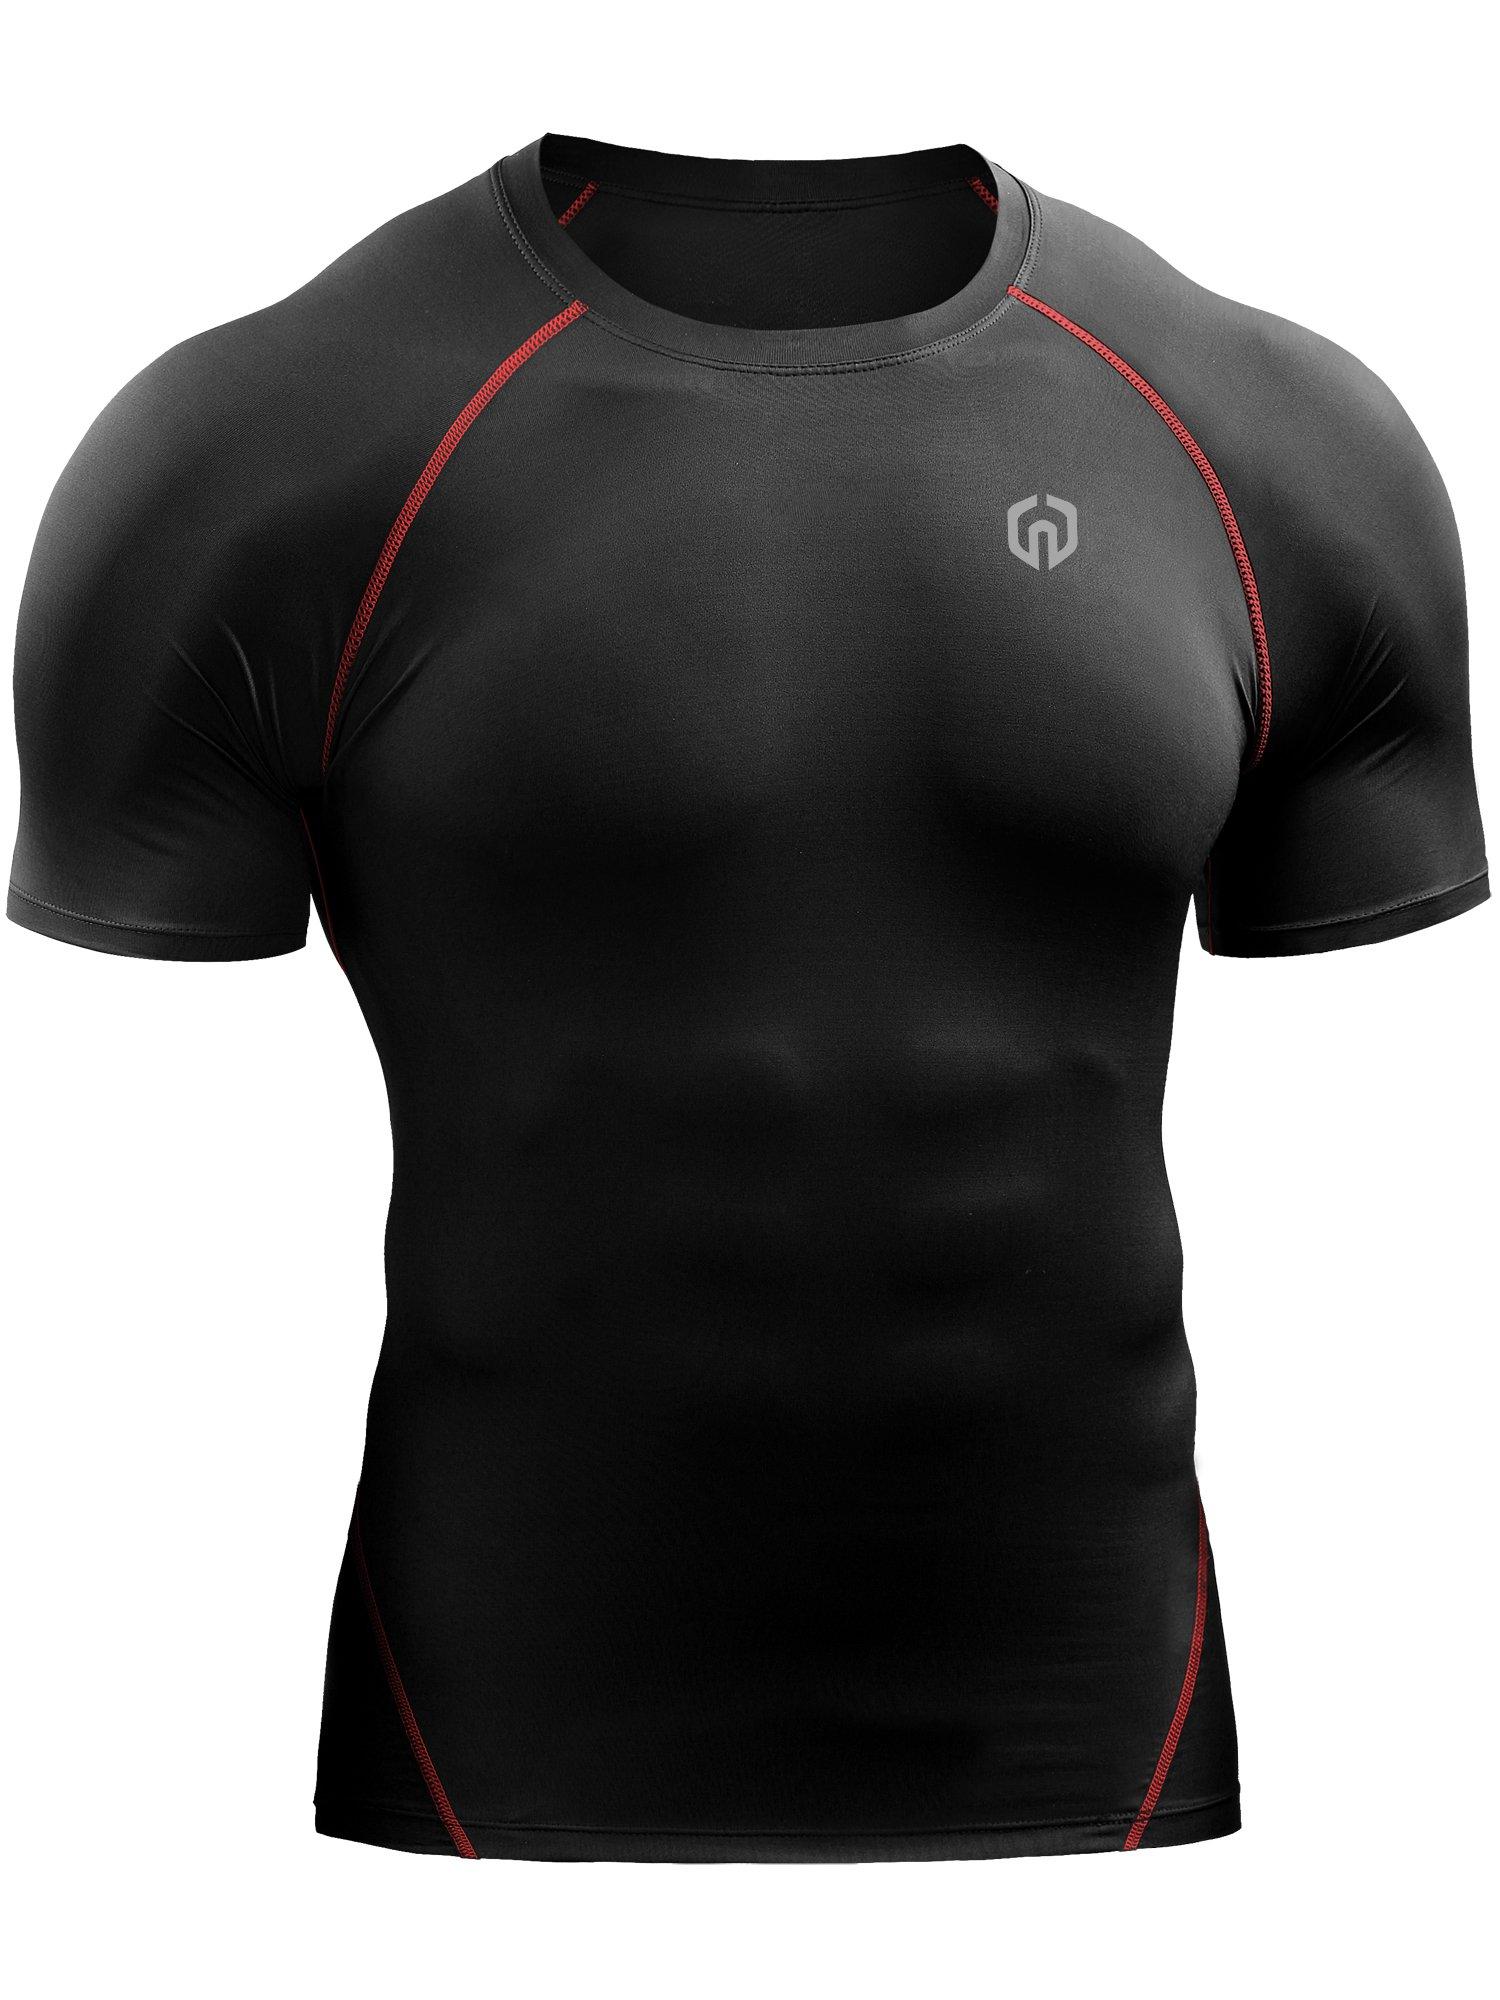 Neleus Men's Compression Baselayer Athletic Workout T Shirts,5022,One Piece,Black(red Striped),US S,EU M by Neleus (Image #4)